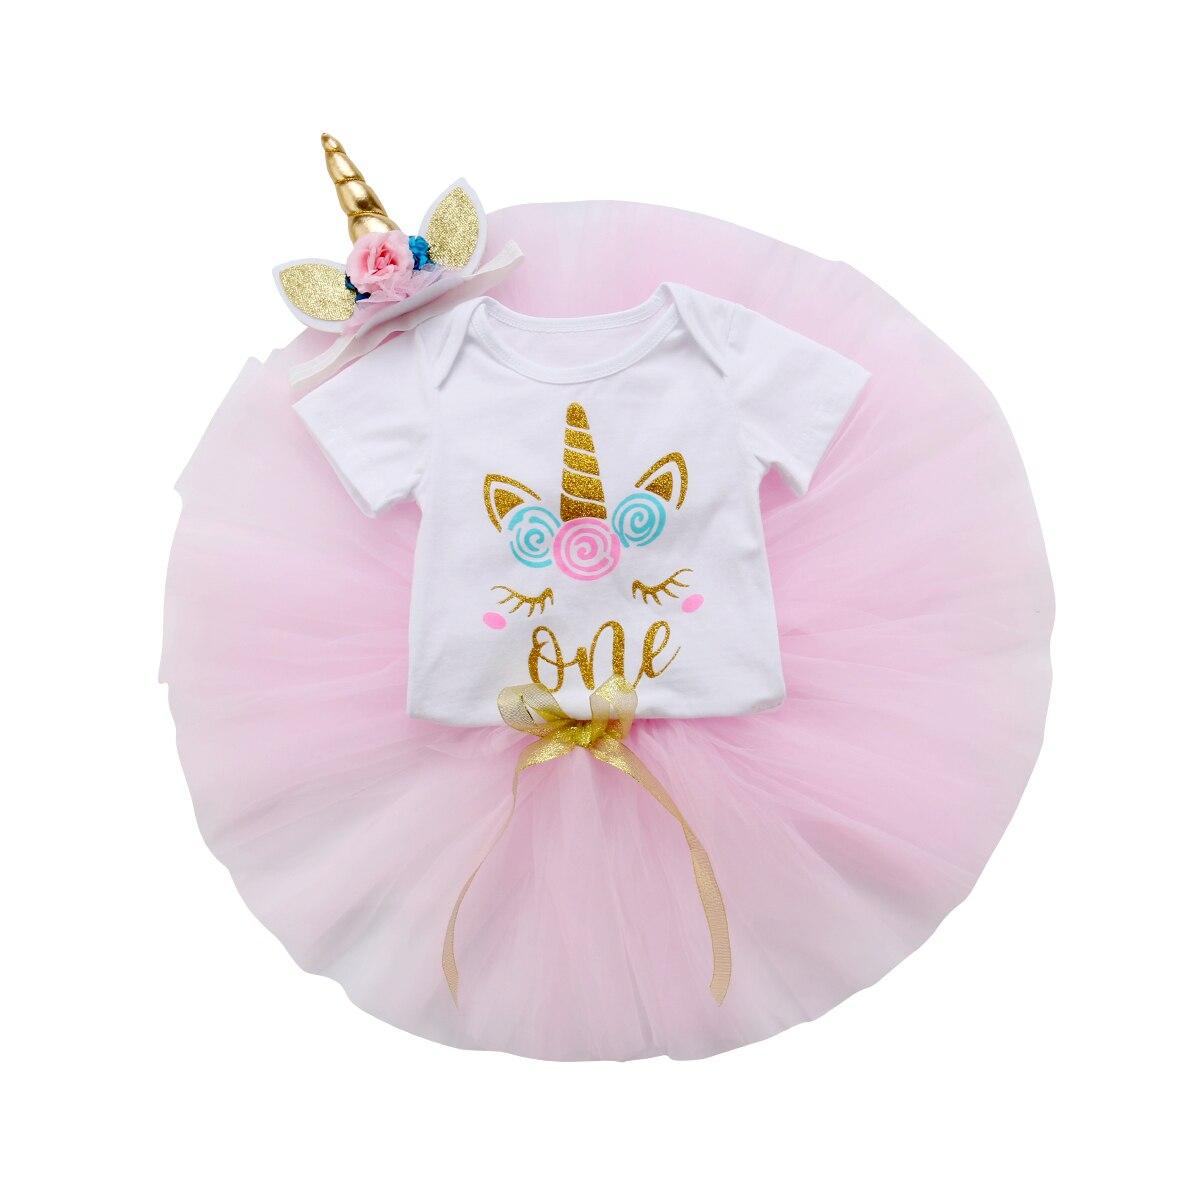 Toddler Baby Girl 3pcs Unicorn Print Top + Mesh Skirt With Headband Bodysuit Set  One Birthday